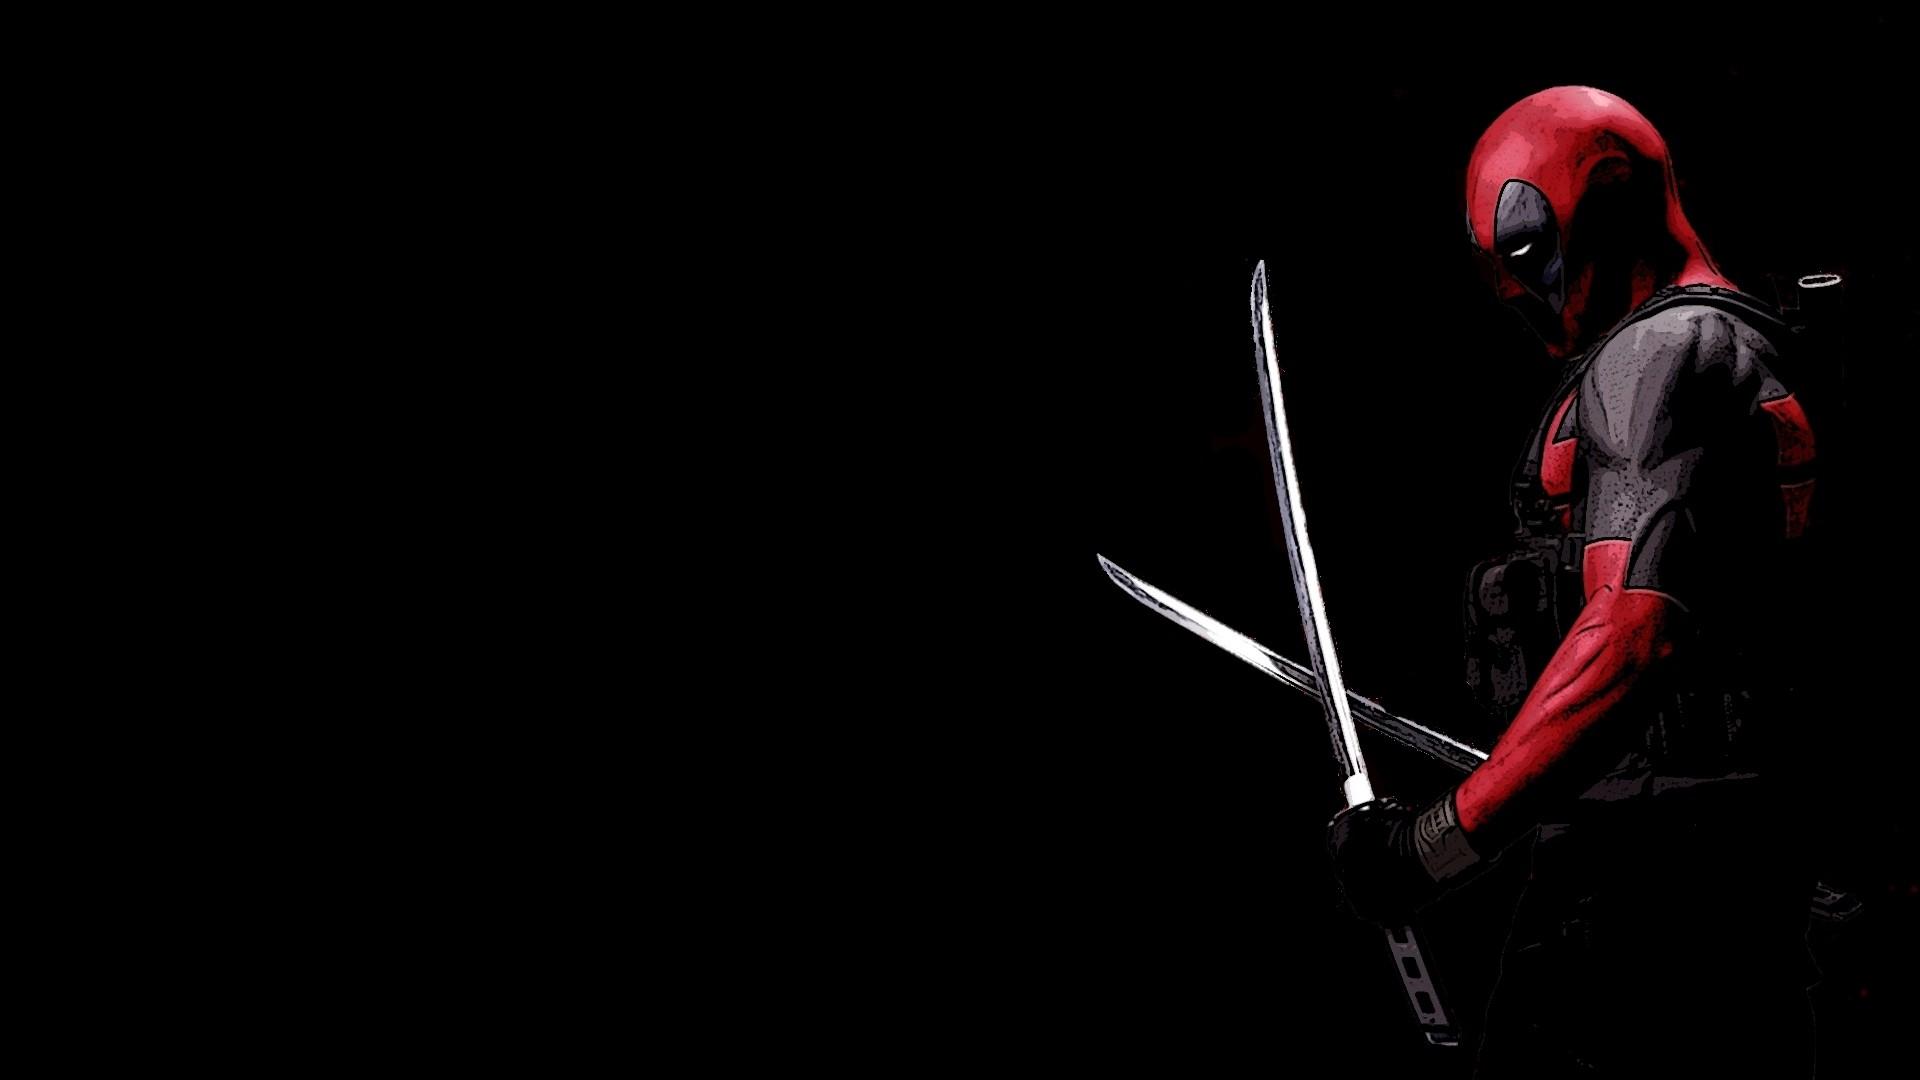 Deadpool Katana Black Background · Deadpool Shooting Soldiers. Deadpool  With Katana Wallpaper HD